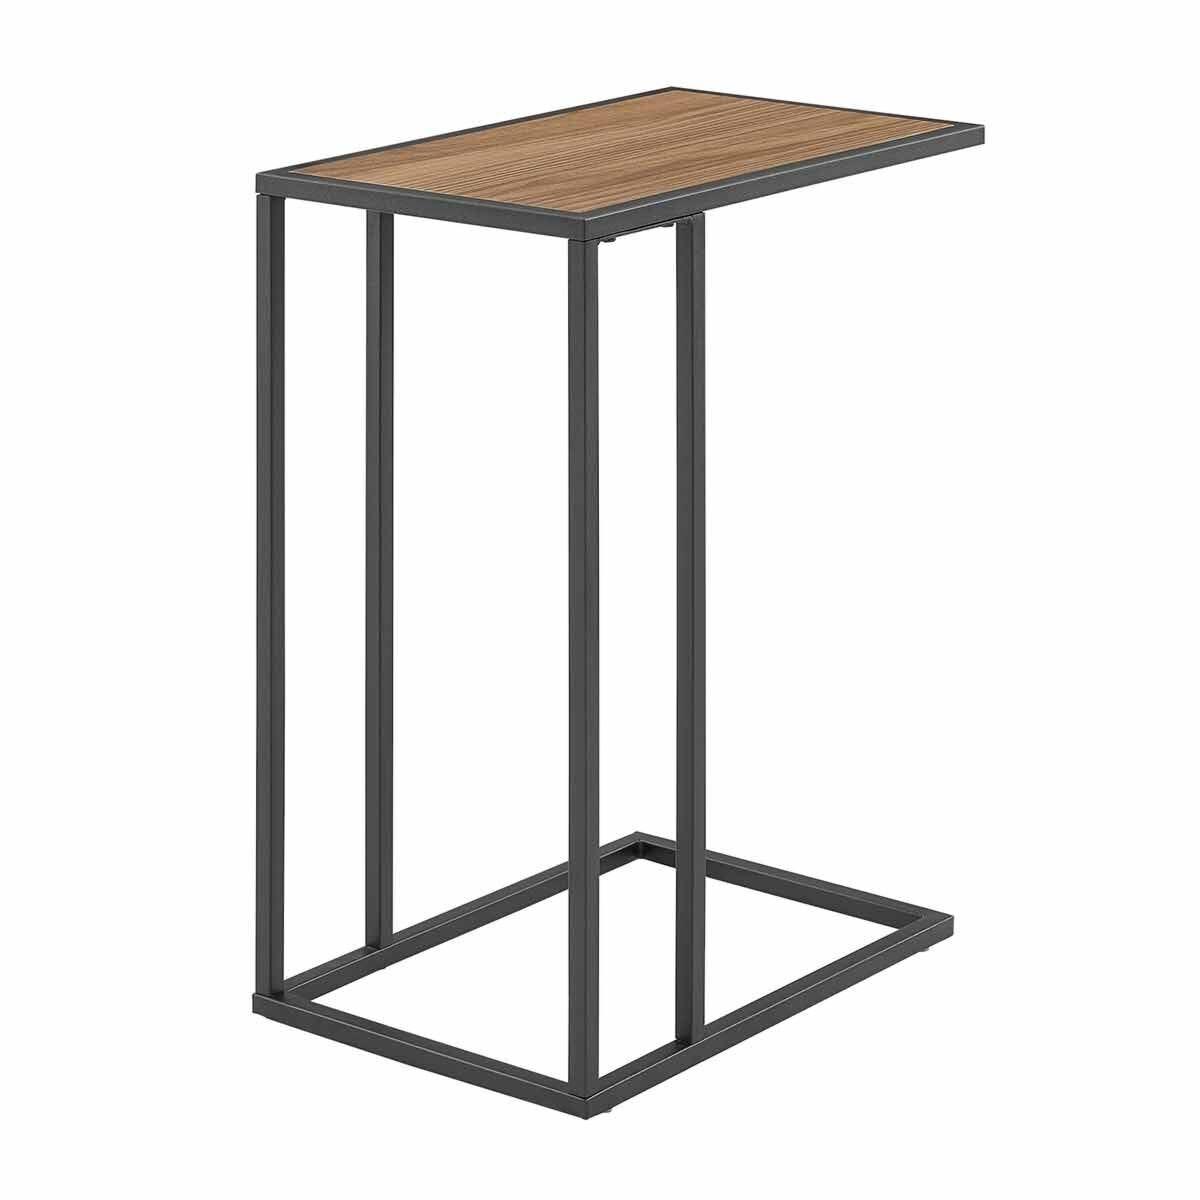 Aversa Modern End Table